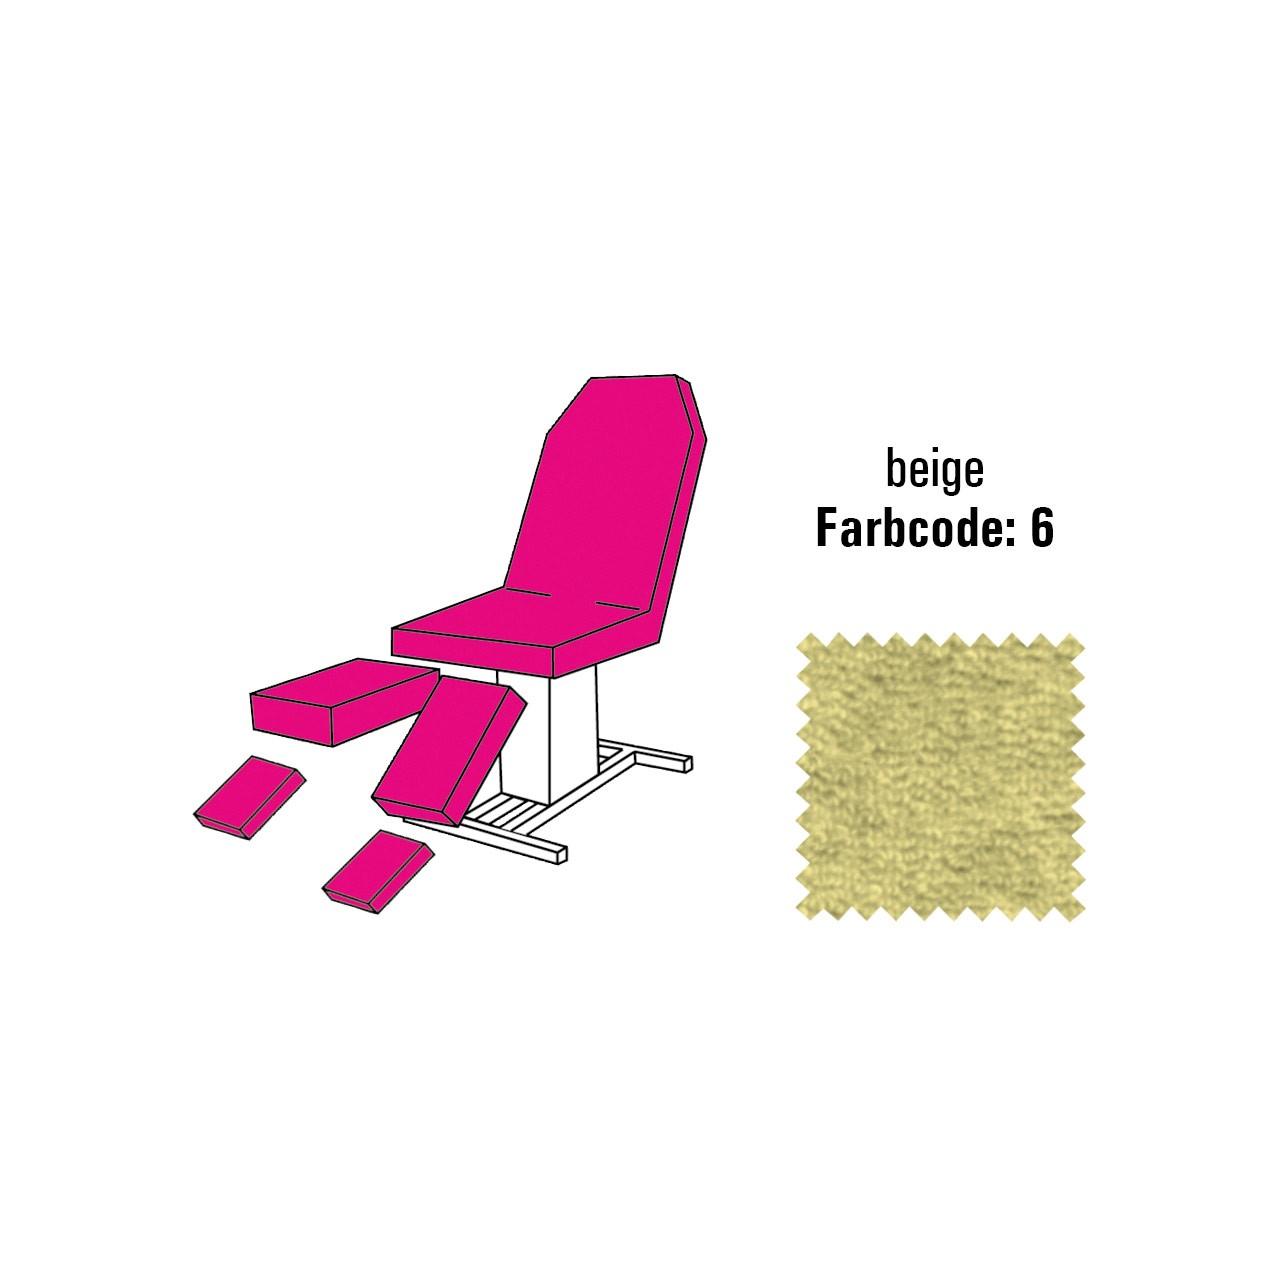 fusspflegestuhl-bezug-set-beige_0000016176.jpg